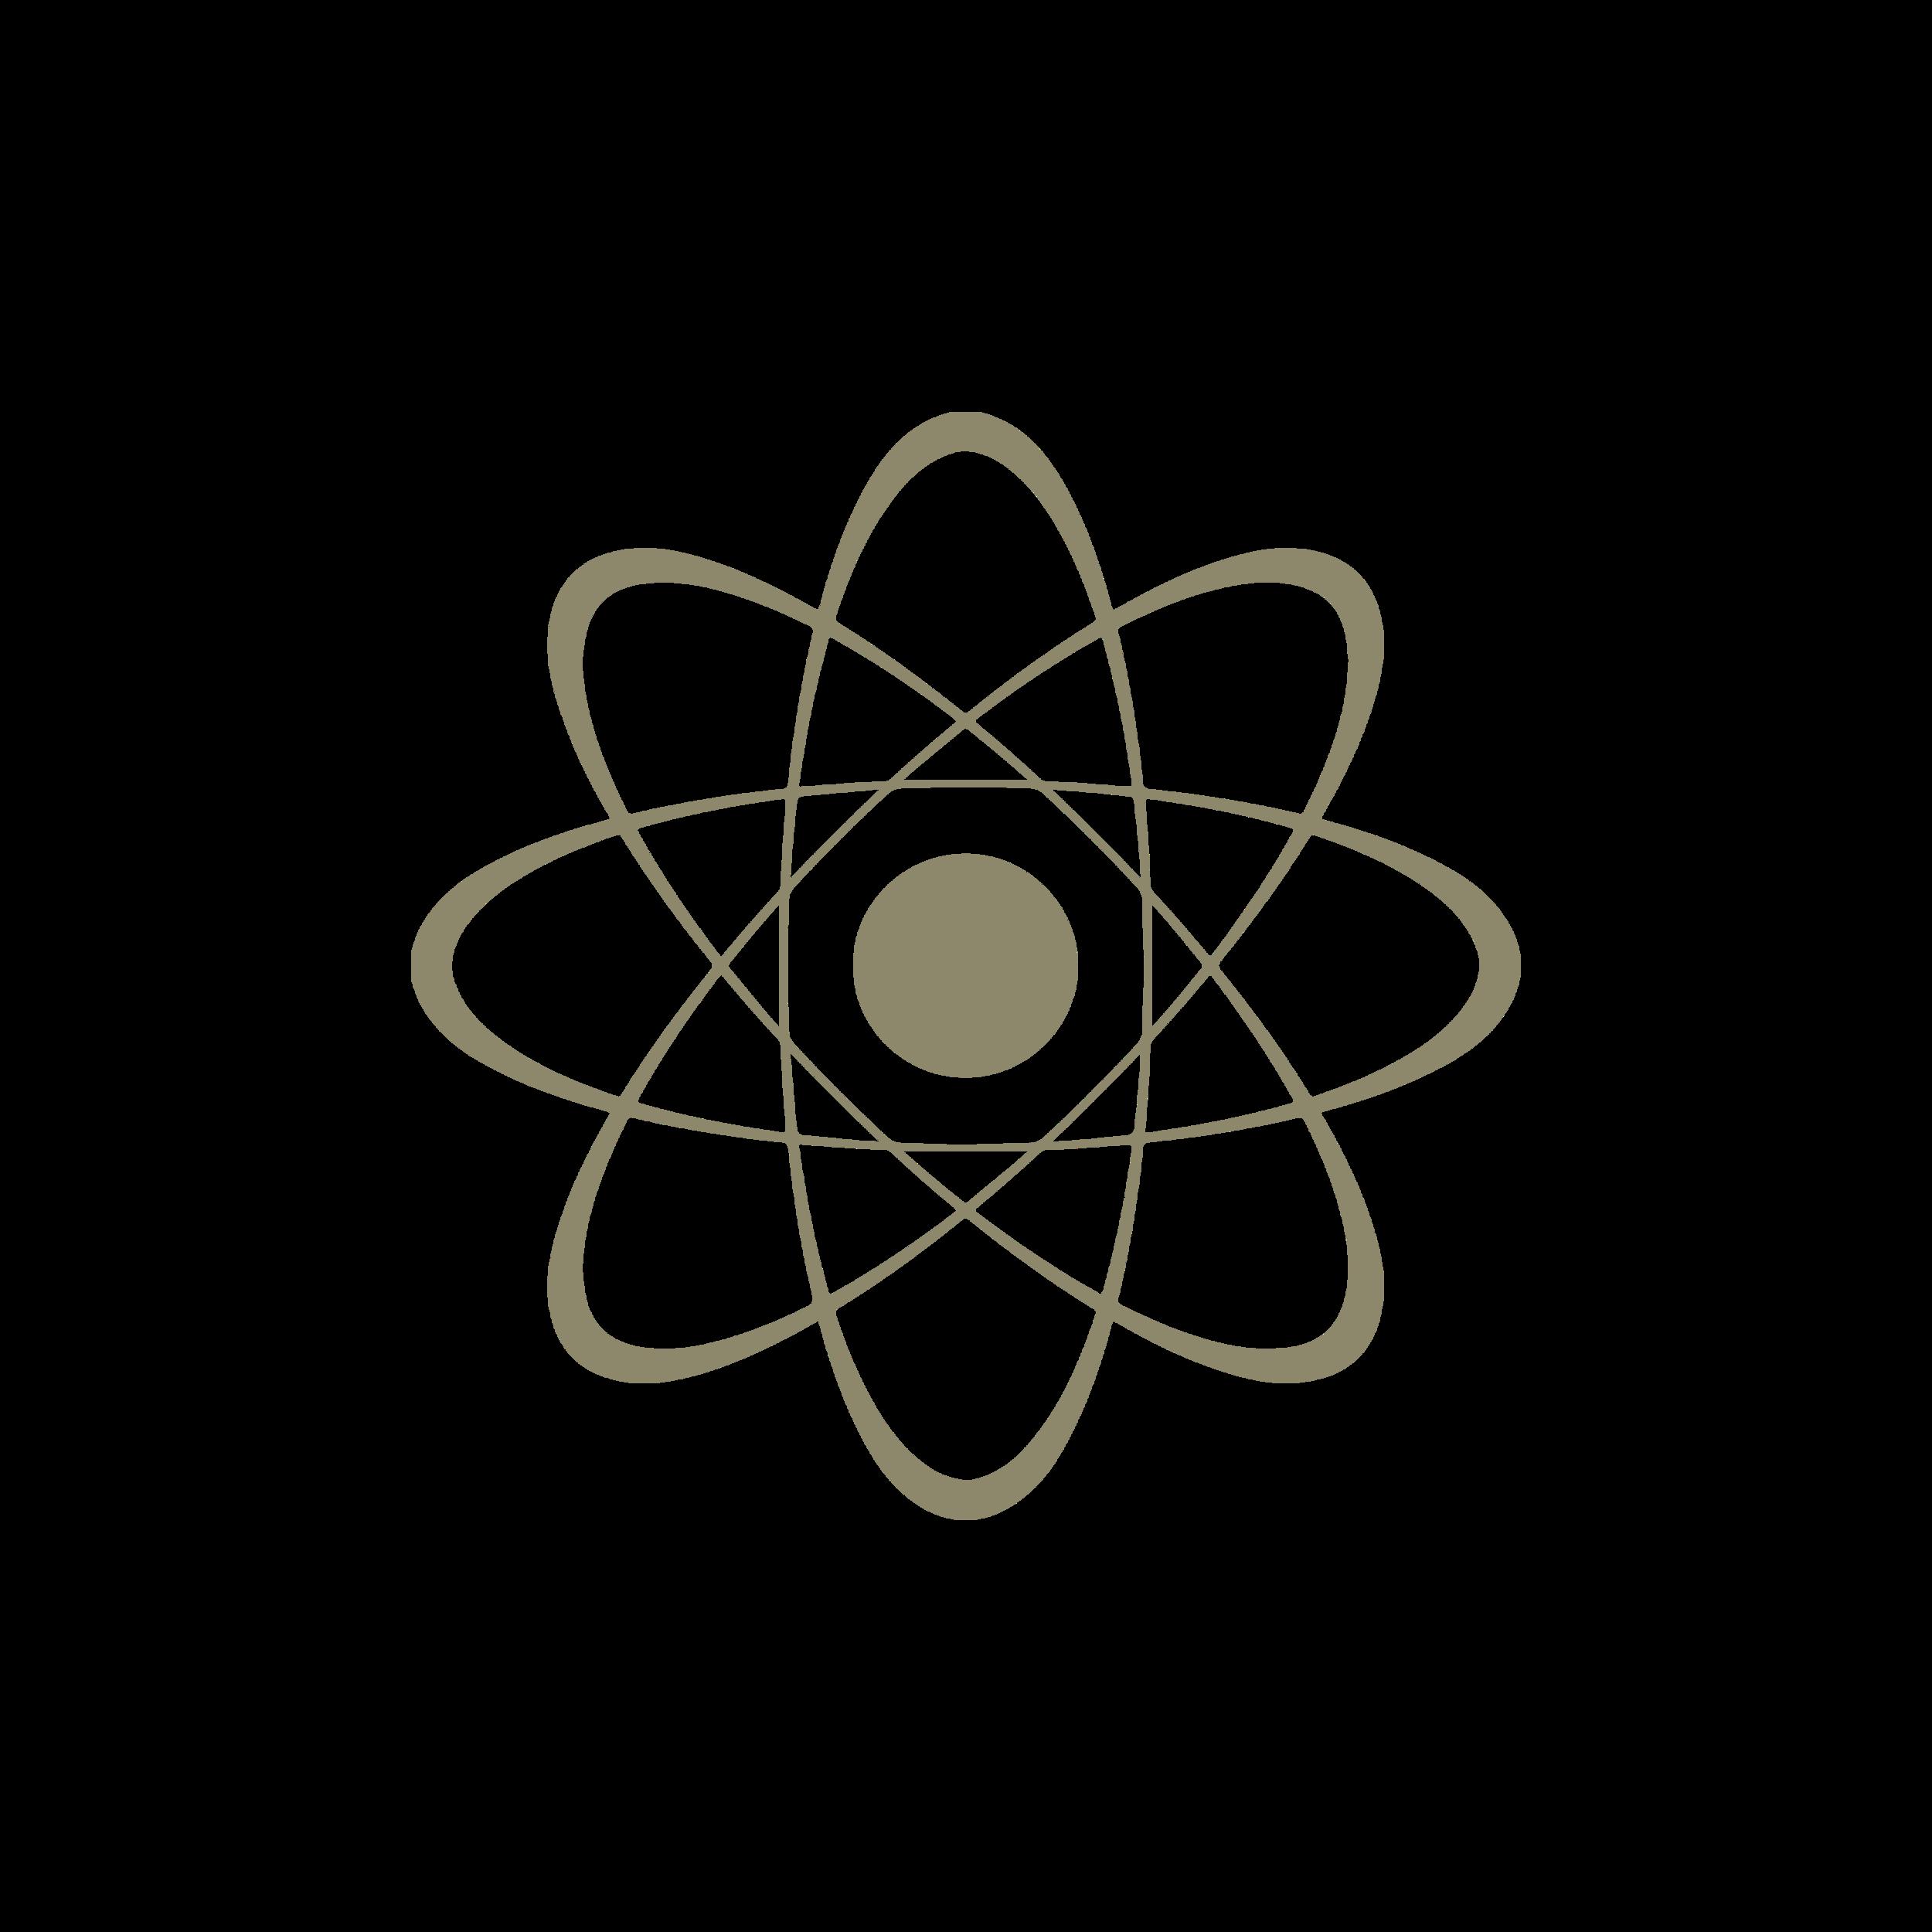 noun_Atomic_34470.png